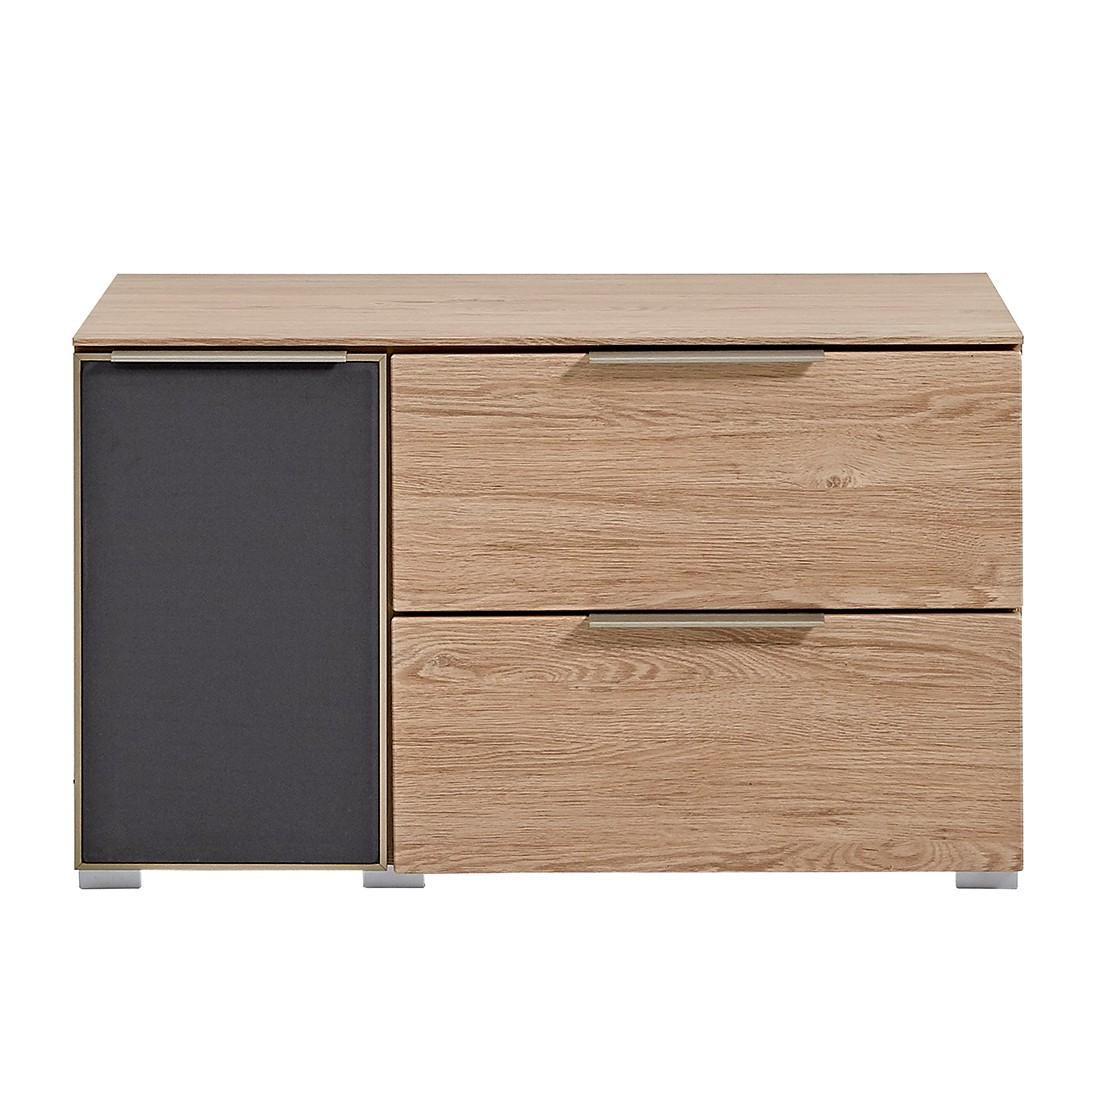 lowboard grau preisvergleich die besten angebote online. Black Bedroom Furniture Sets. Home Design Ideas